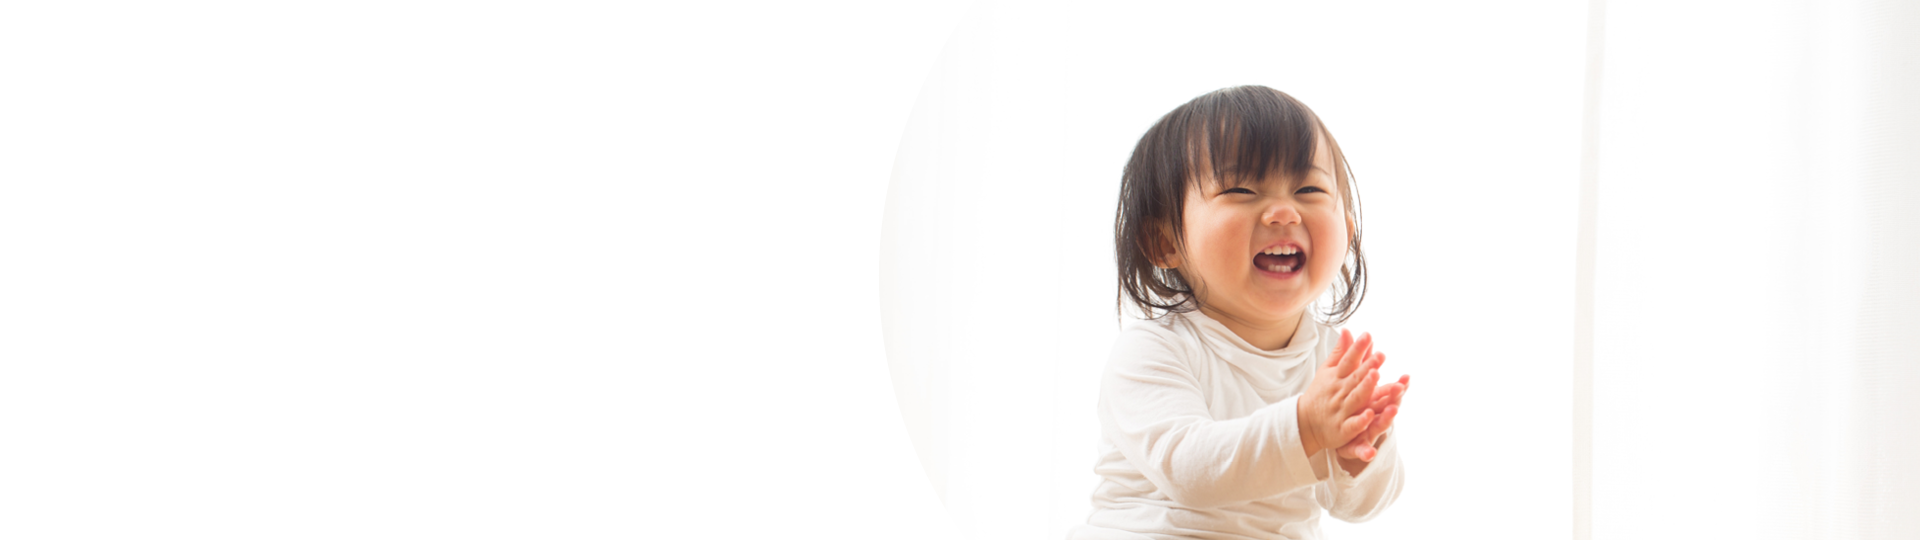 Active Kids Group | Tips for settling in banner |